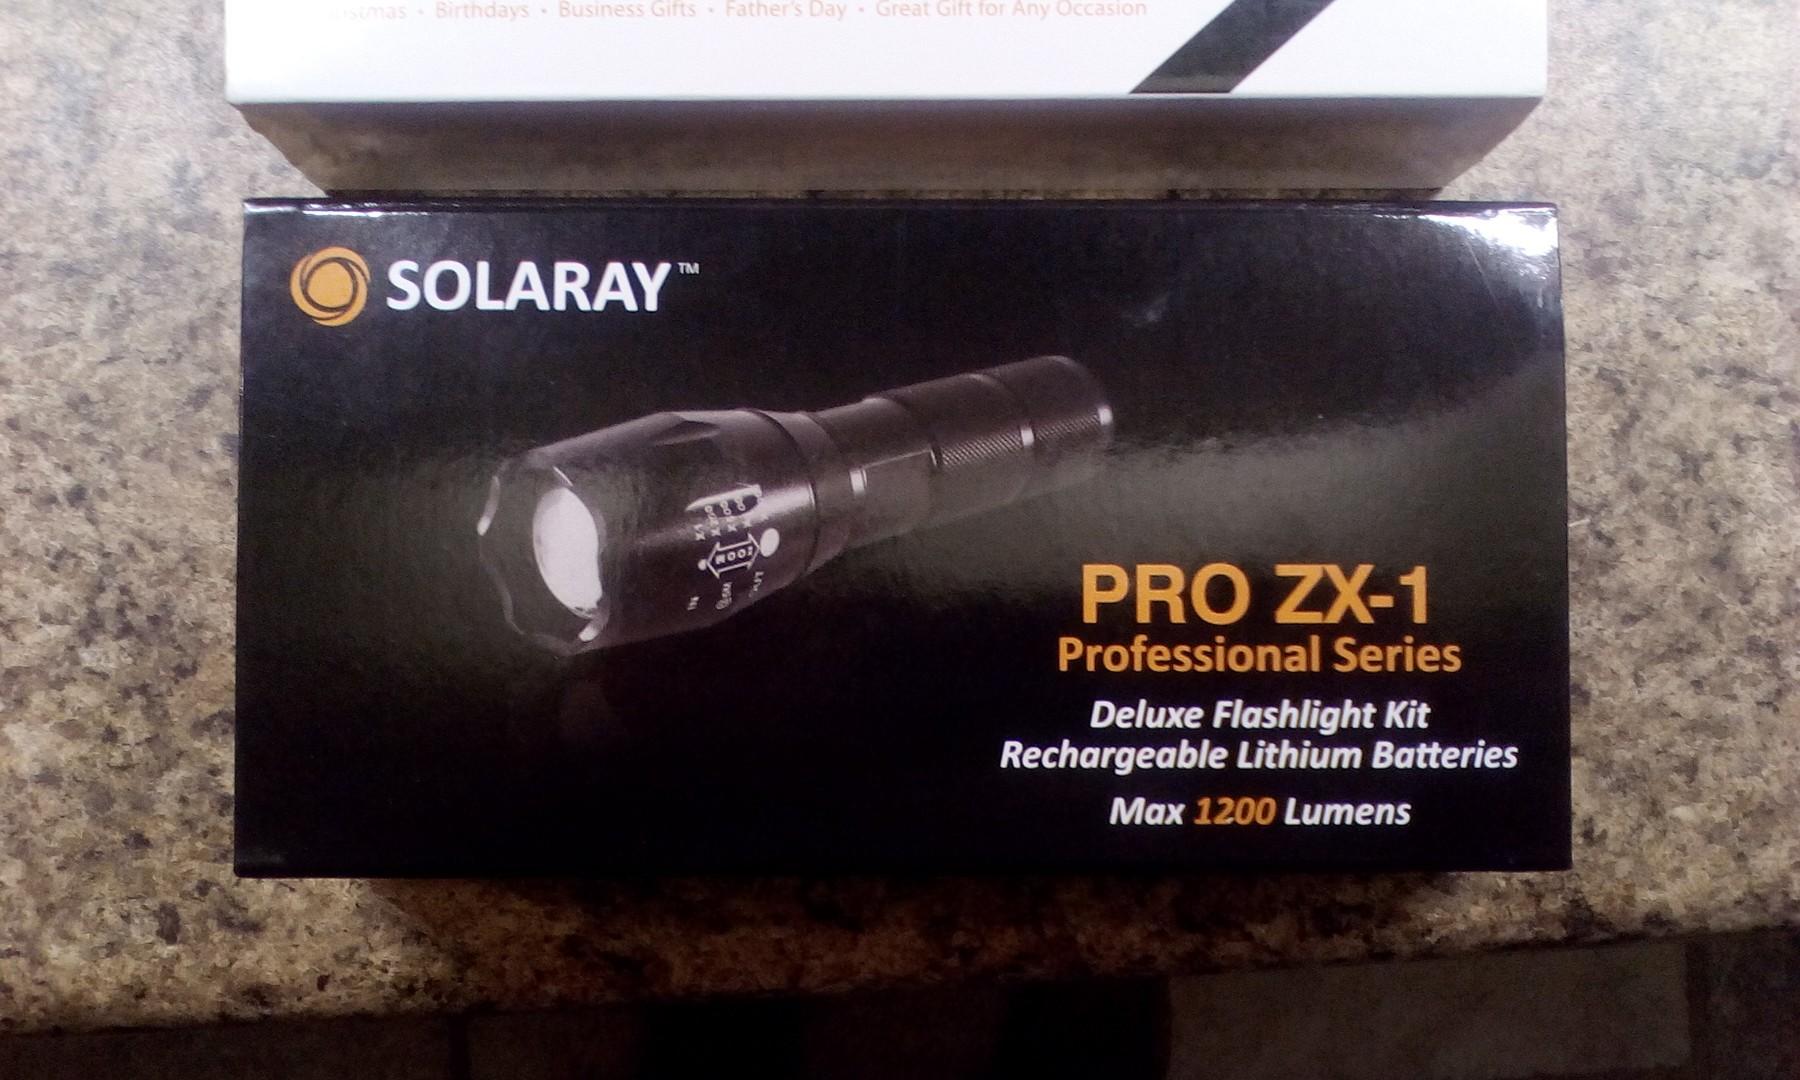 Complete emergency lighting kit